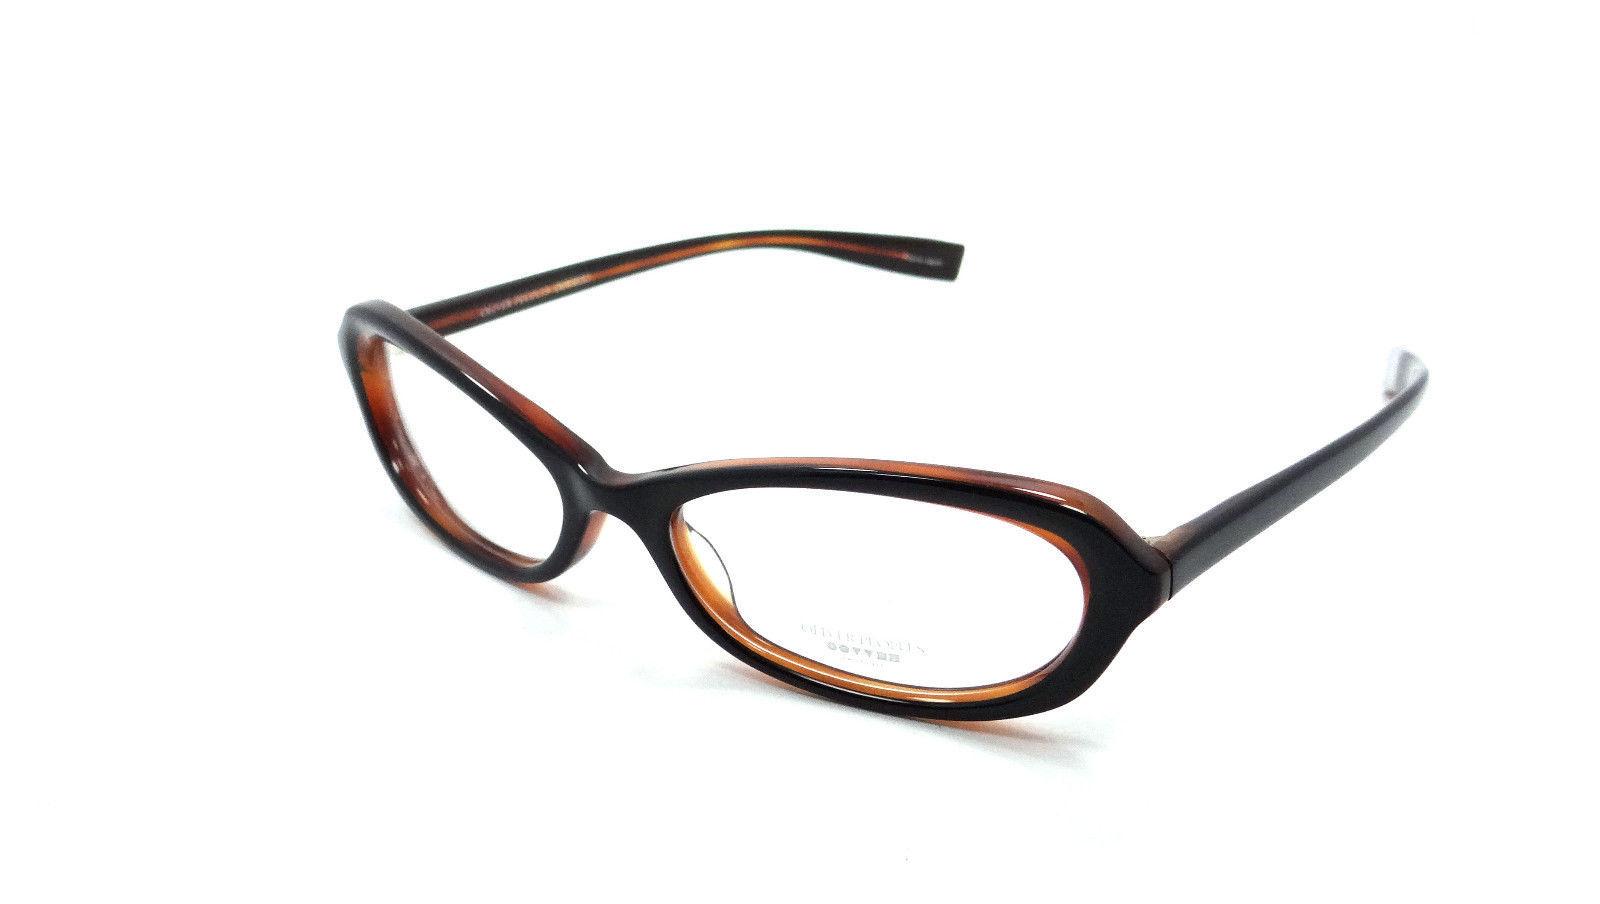 b07adbdeb8d Oliver Peoples Rx Eyeglasses Frames Bridget and 50 similar items. 57